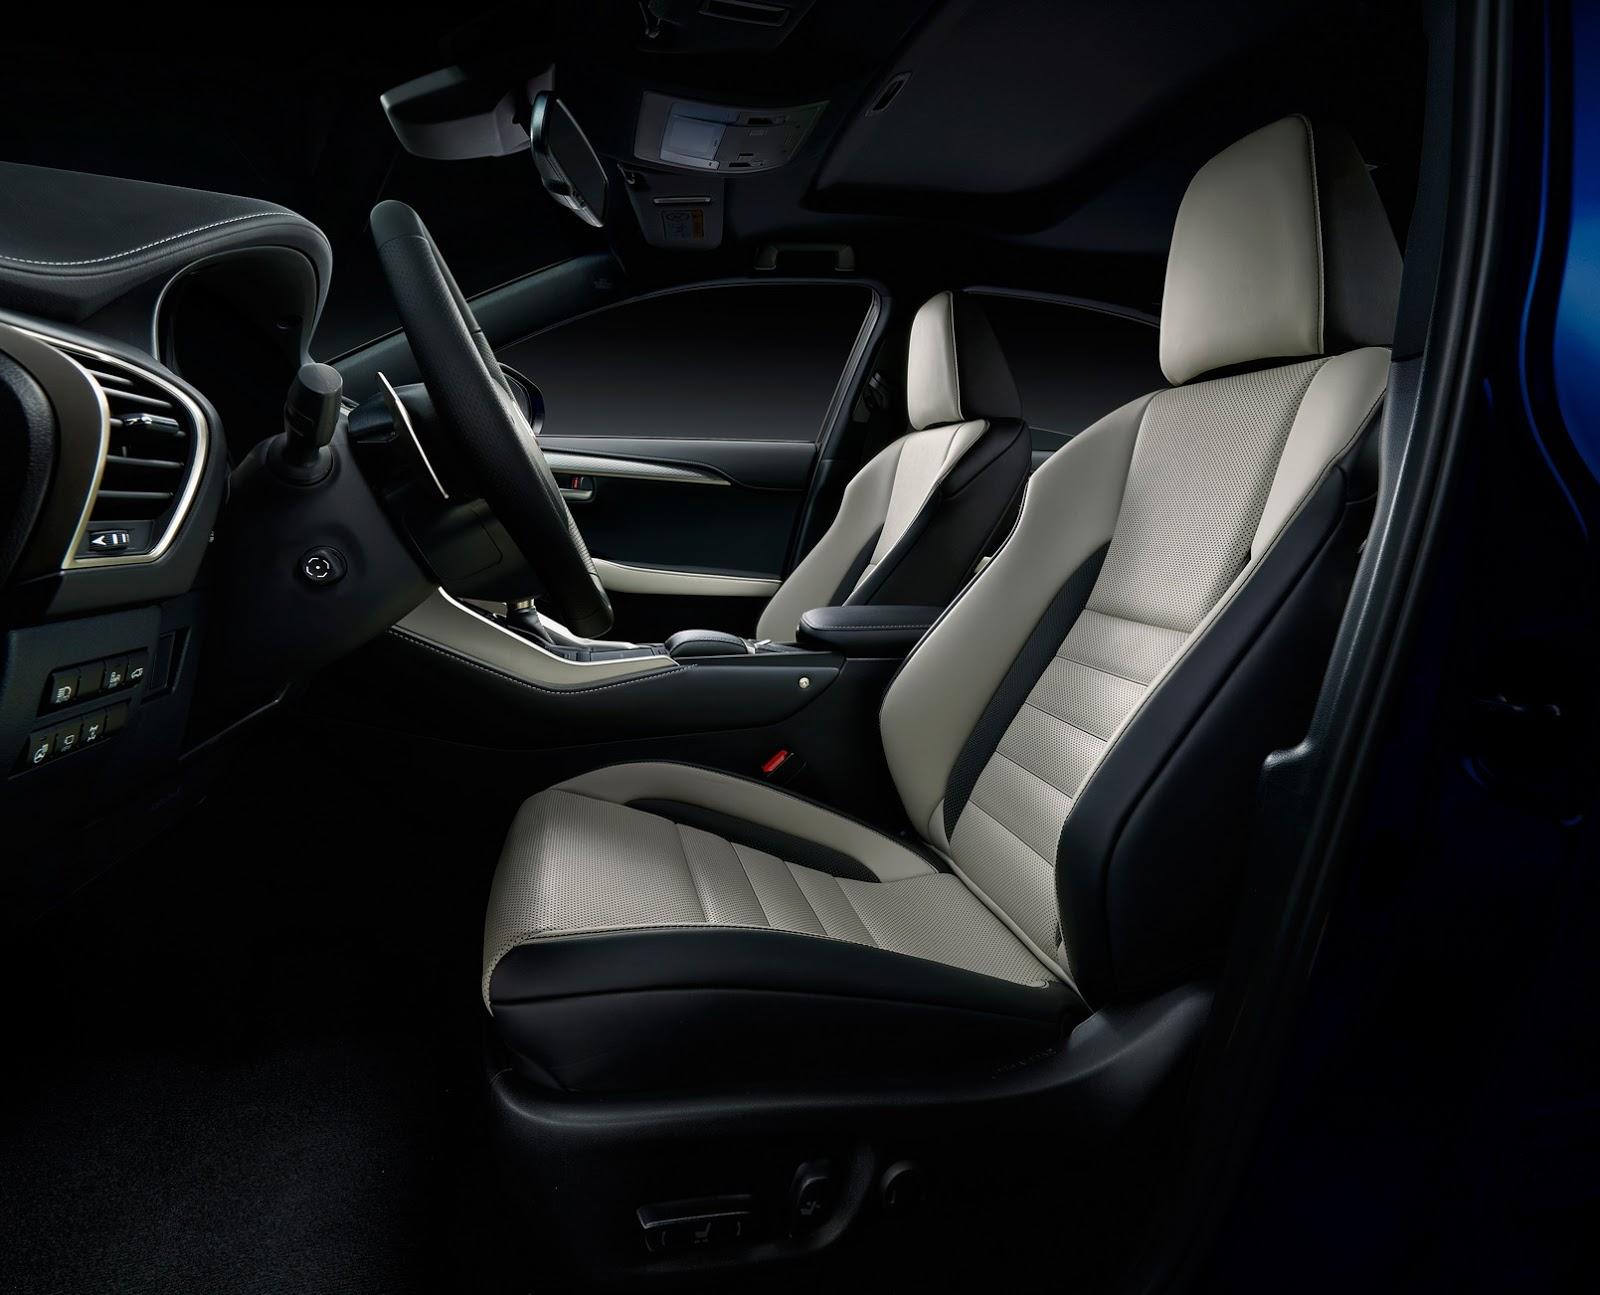 Lexus NX facelift 2018 (22)